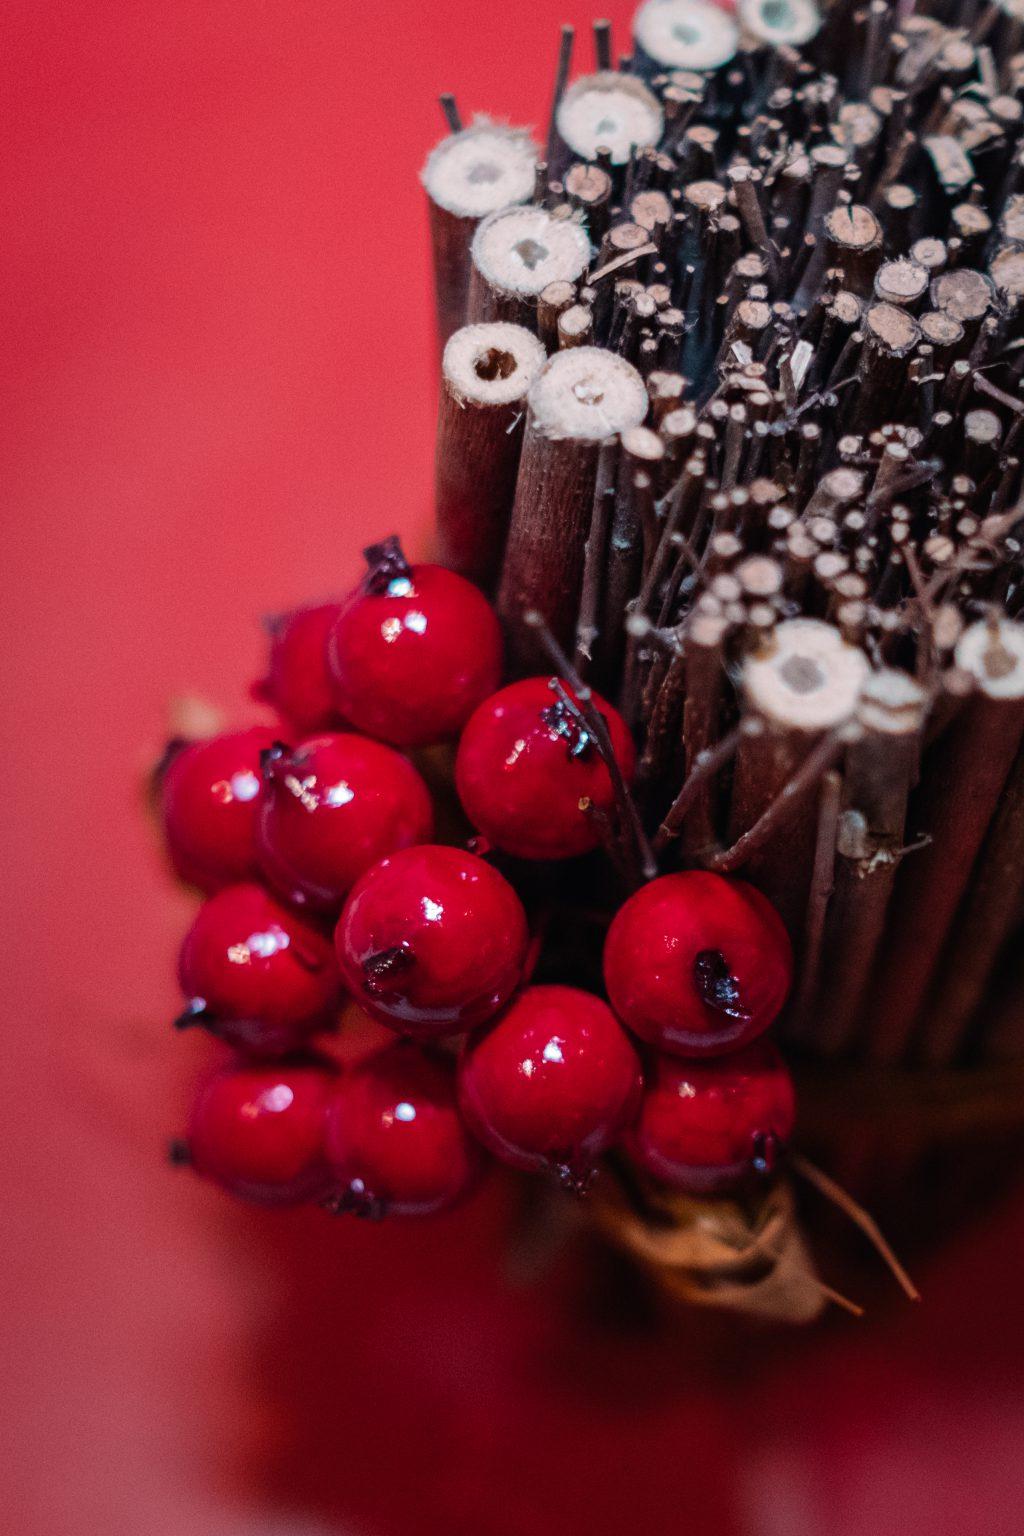 Christmas holly fruit decoration - free stock photo